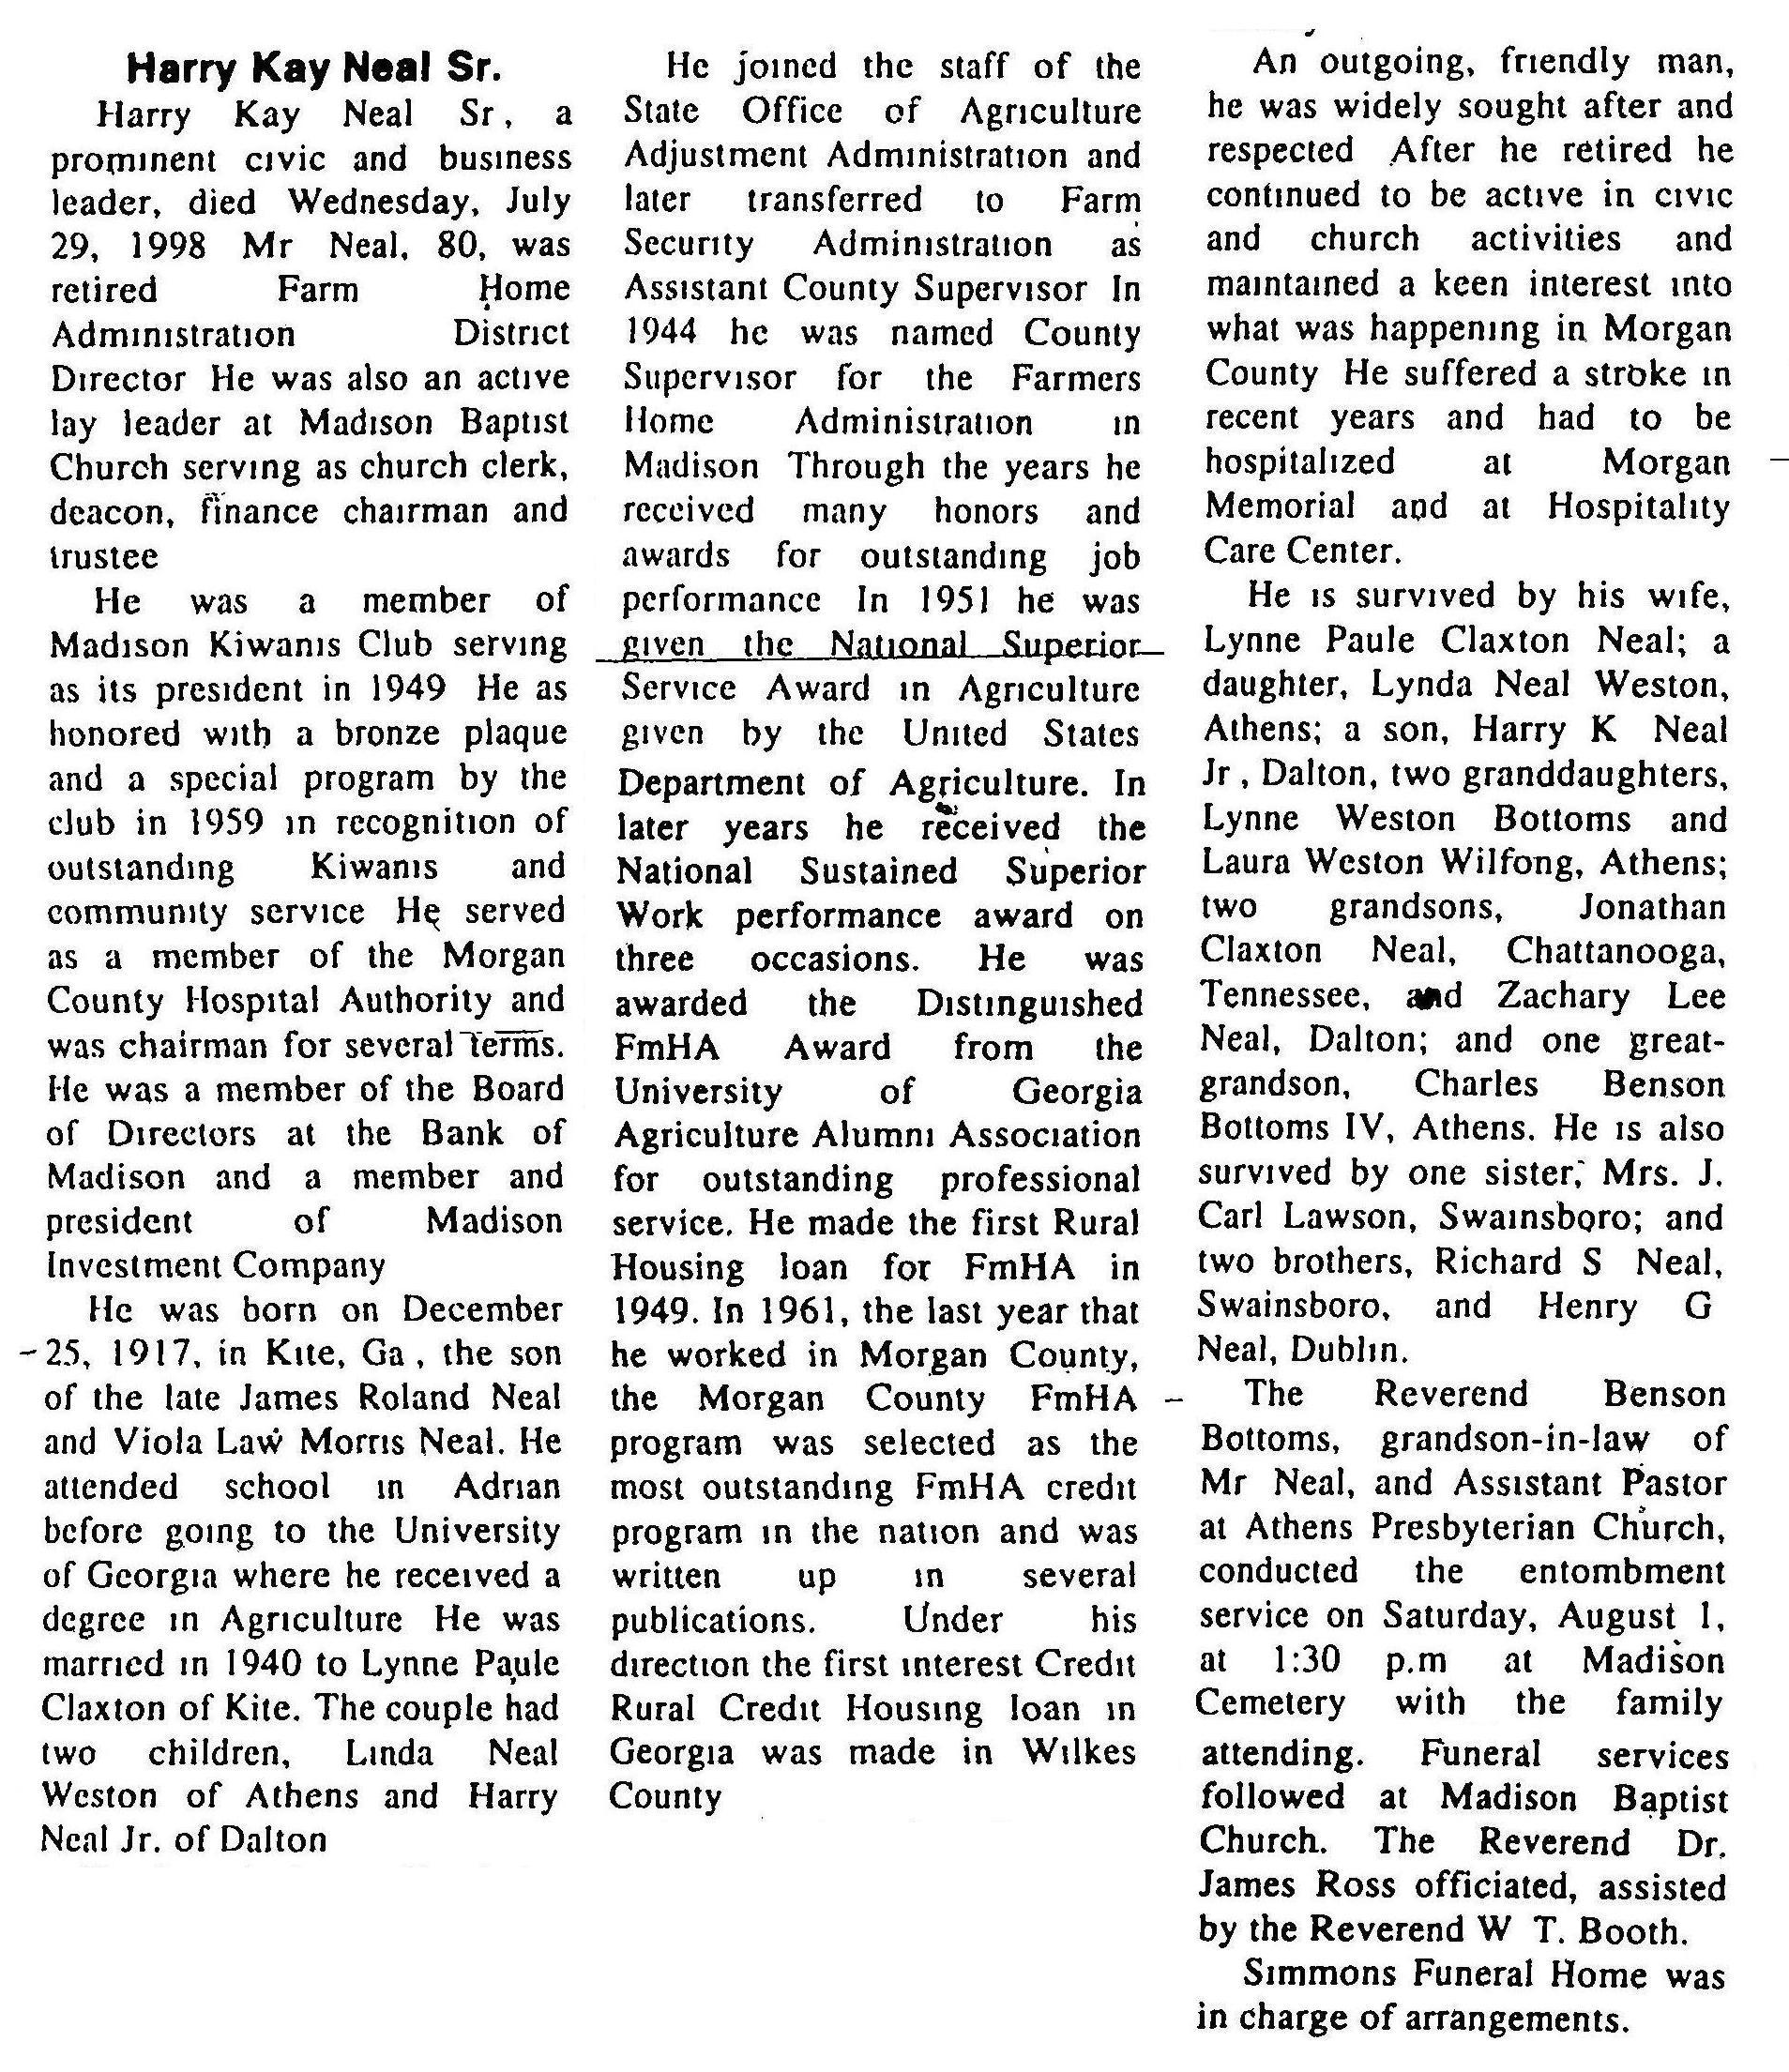 neal_harrykay_1998-obituary.jpeg